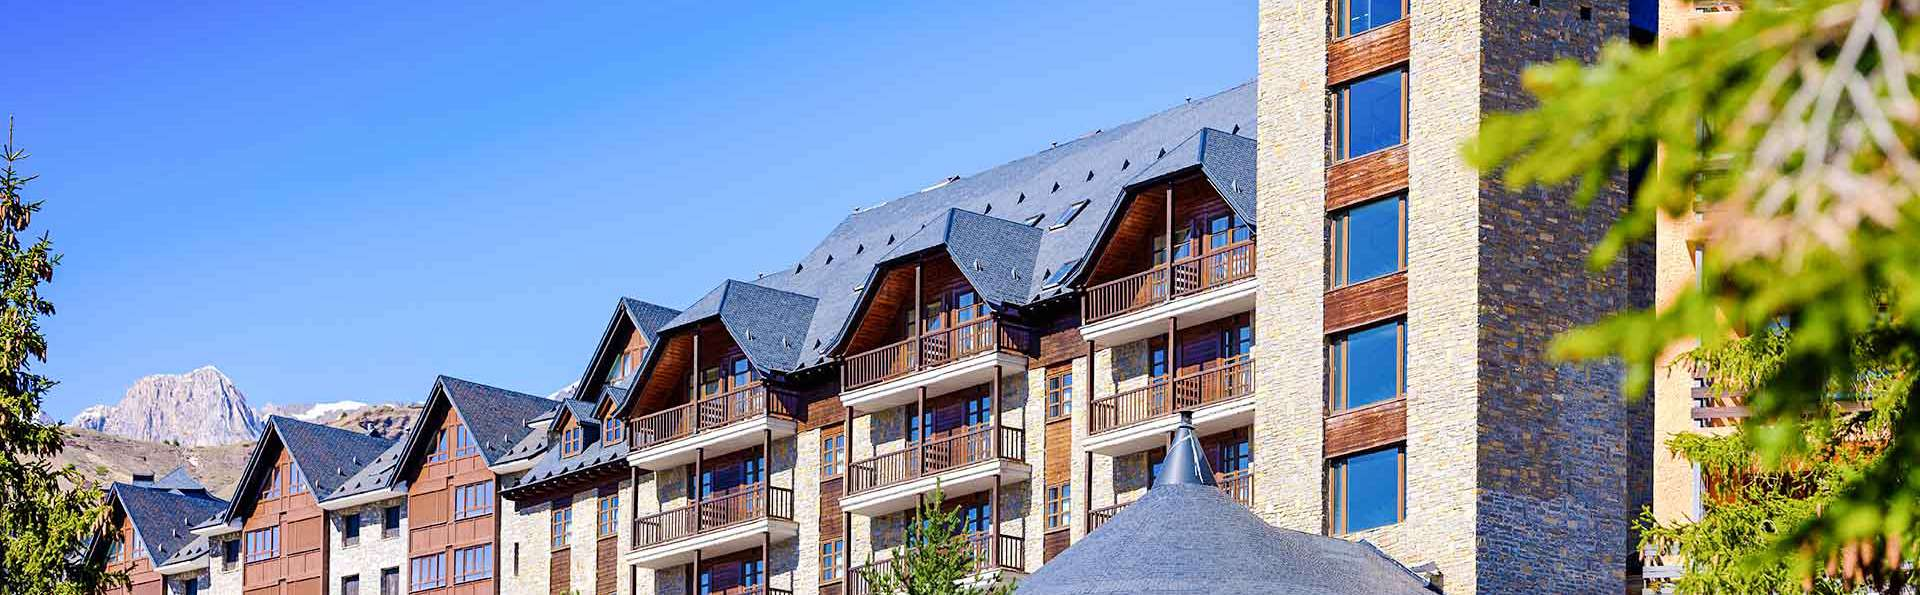 Aragon Hills Hotel & Spa - EDIT_EXTERIOR_01.jpg